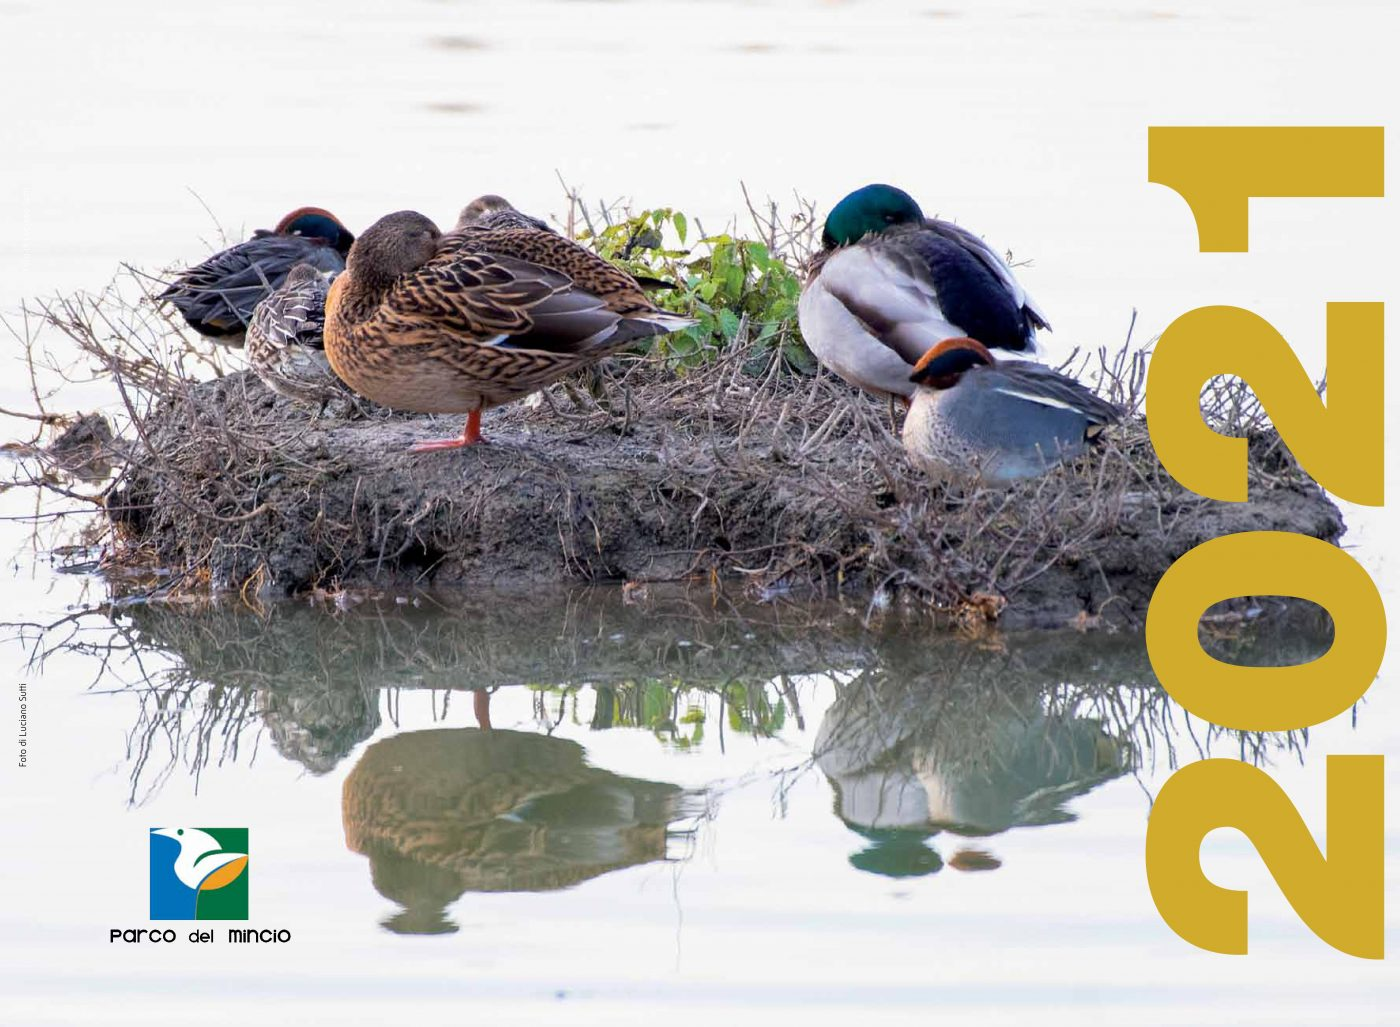 Biodiversität ist der Protagonist des Kalenders 2021 des Parco del Mincio